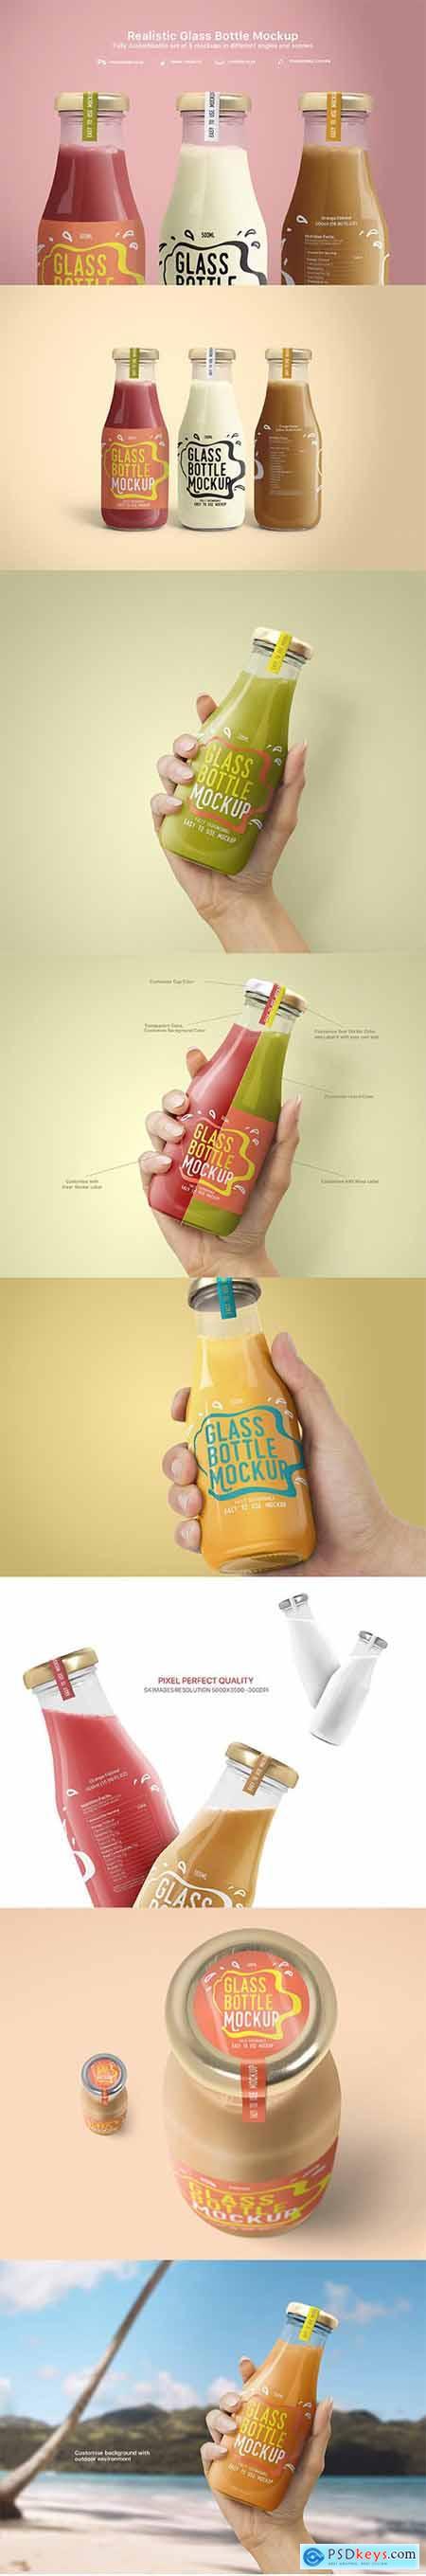 Realistic Glass Bottle Mockups